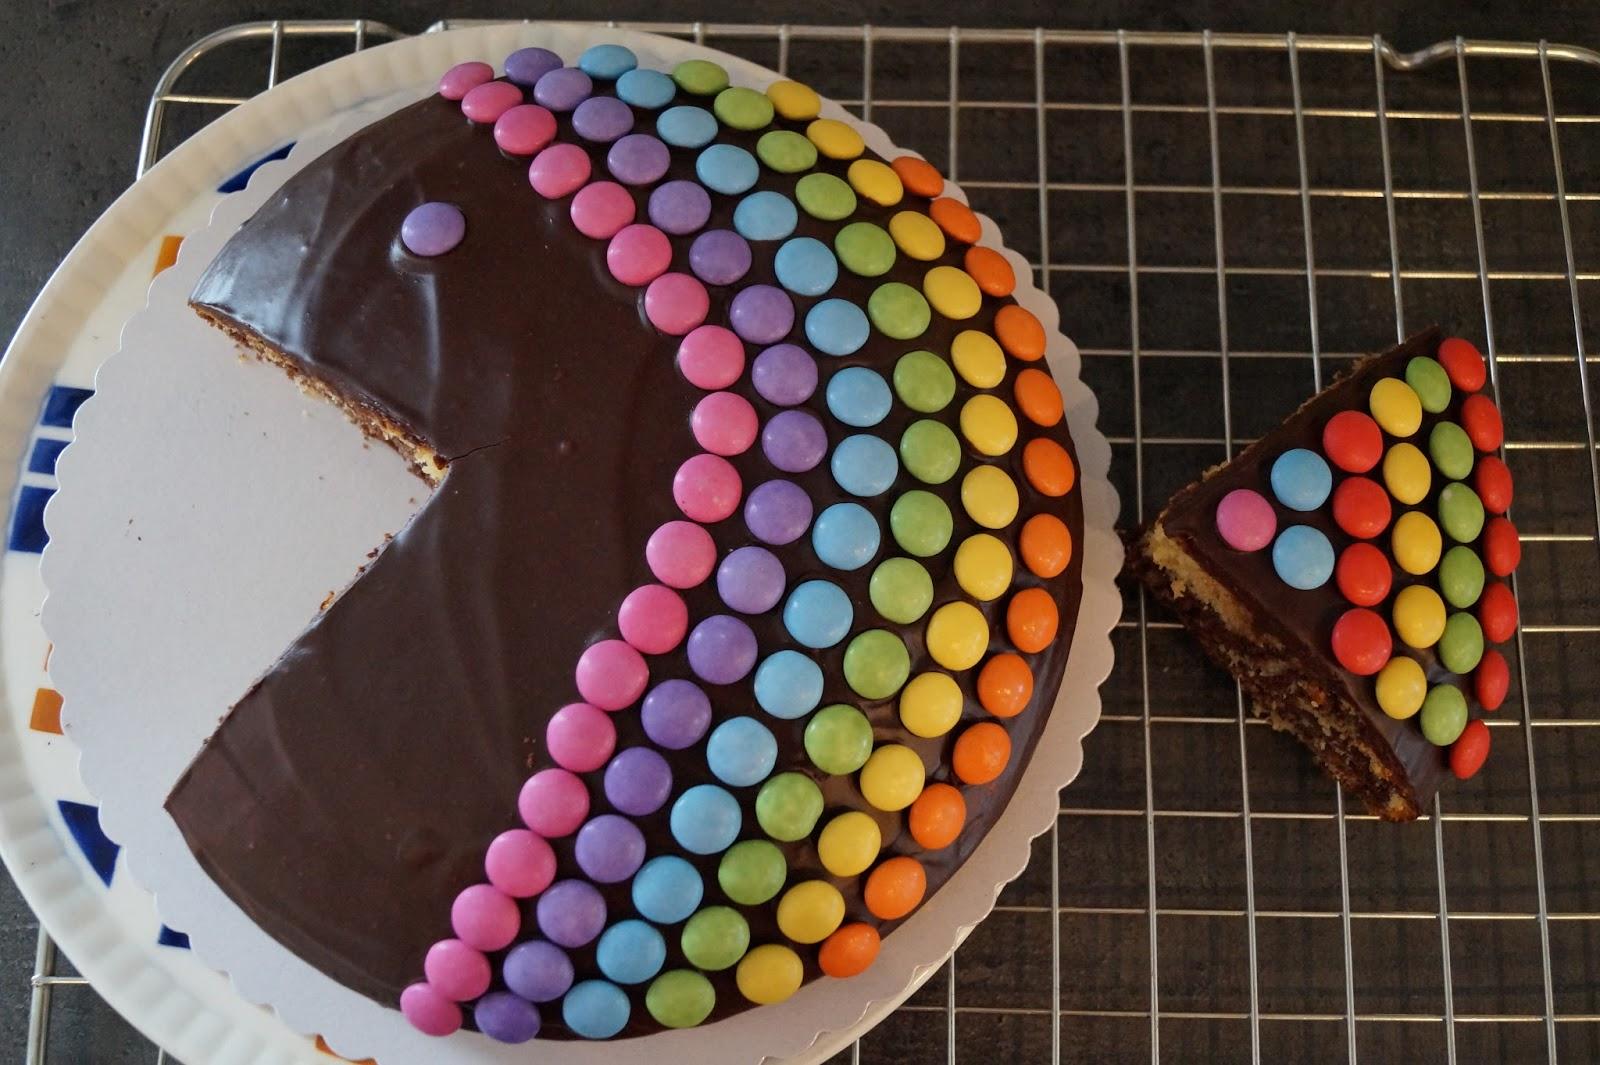 Einladung 50 Geburtstag Lustig - Geburstag